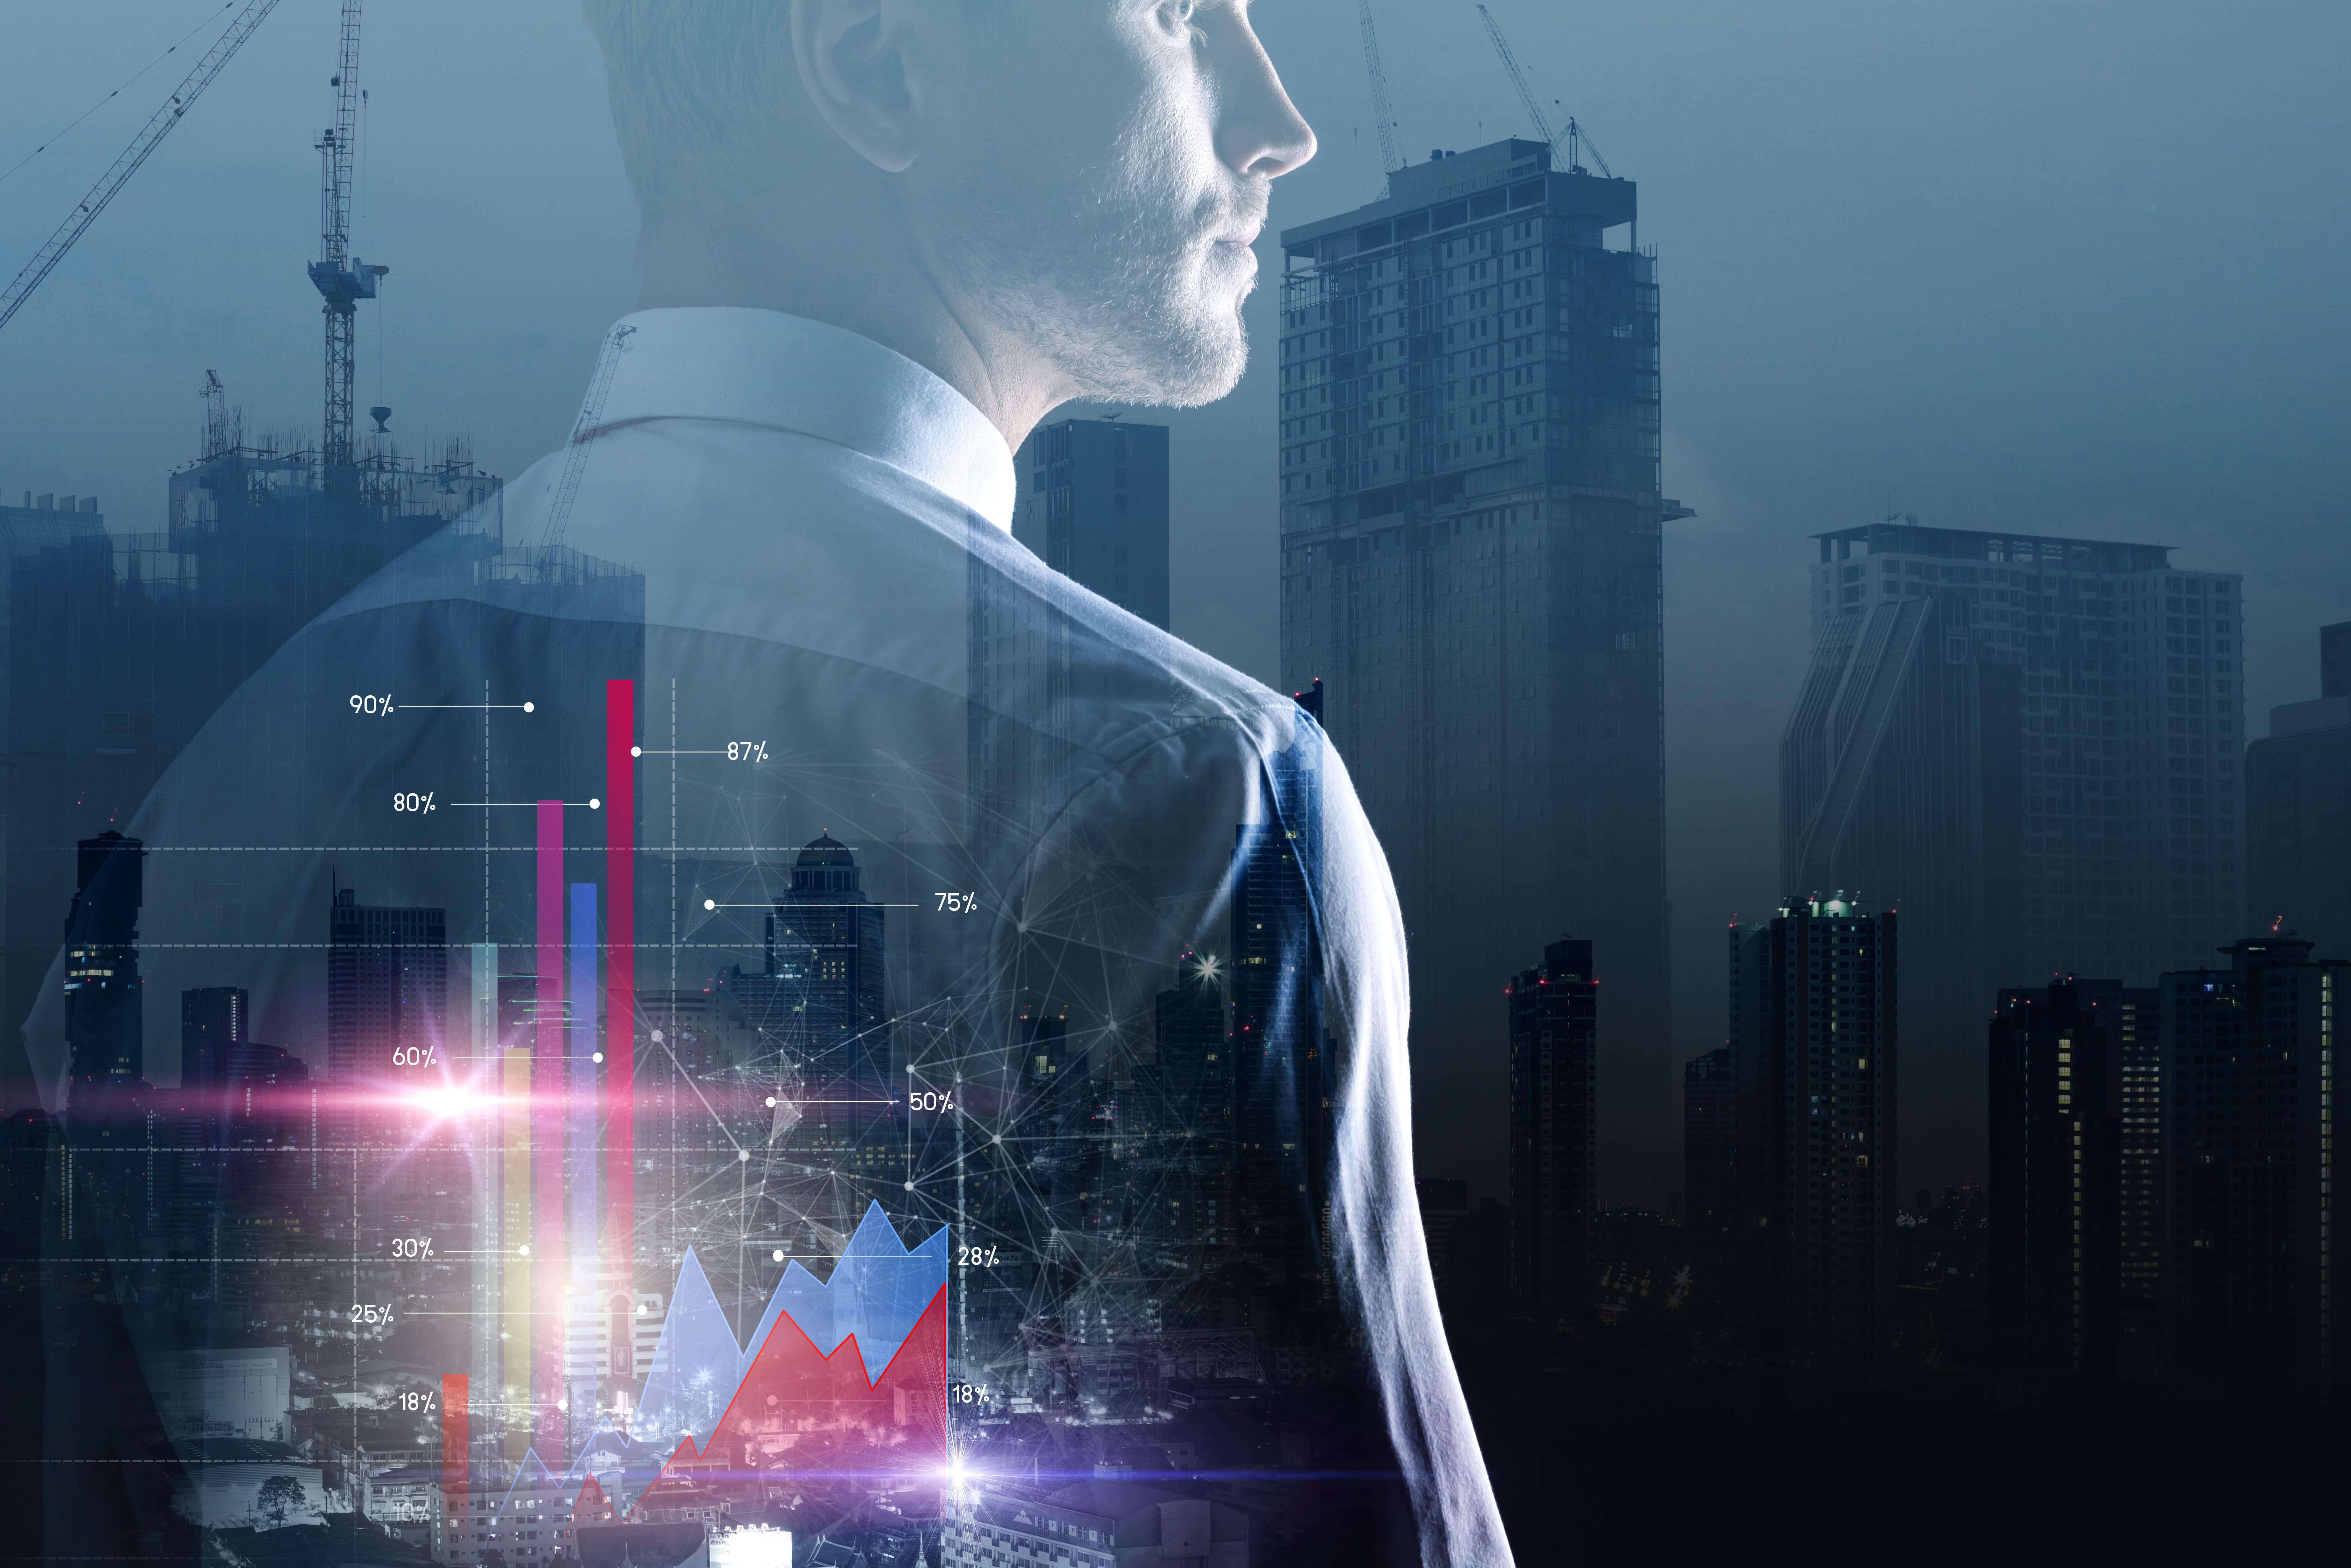 FX初心者が把握すべき重要度の高い「経済指標」と「要人発言」の基本